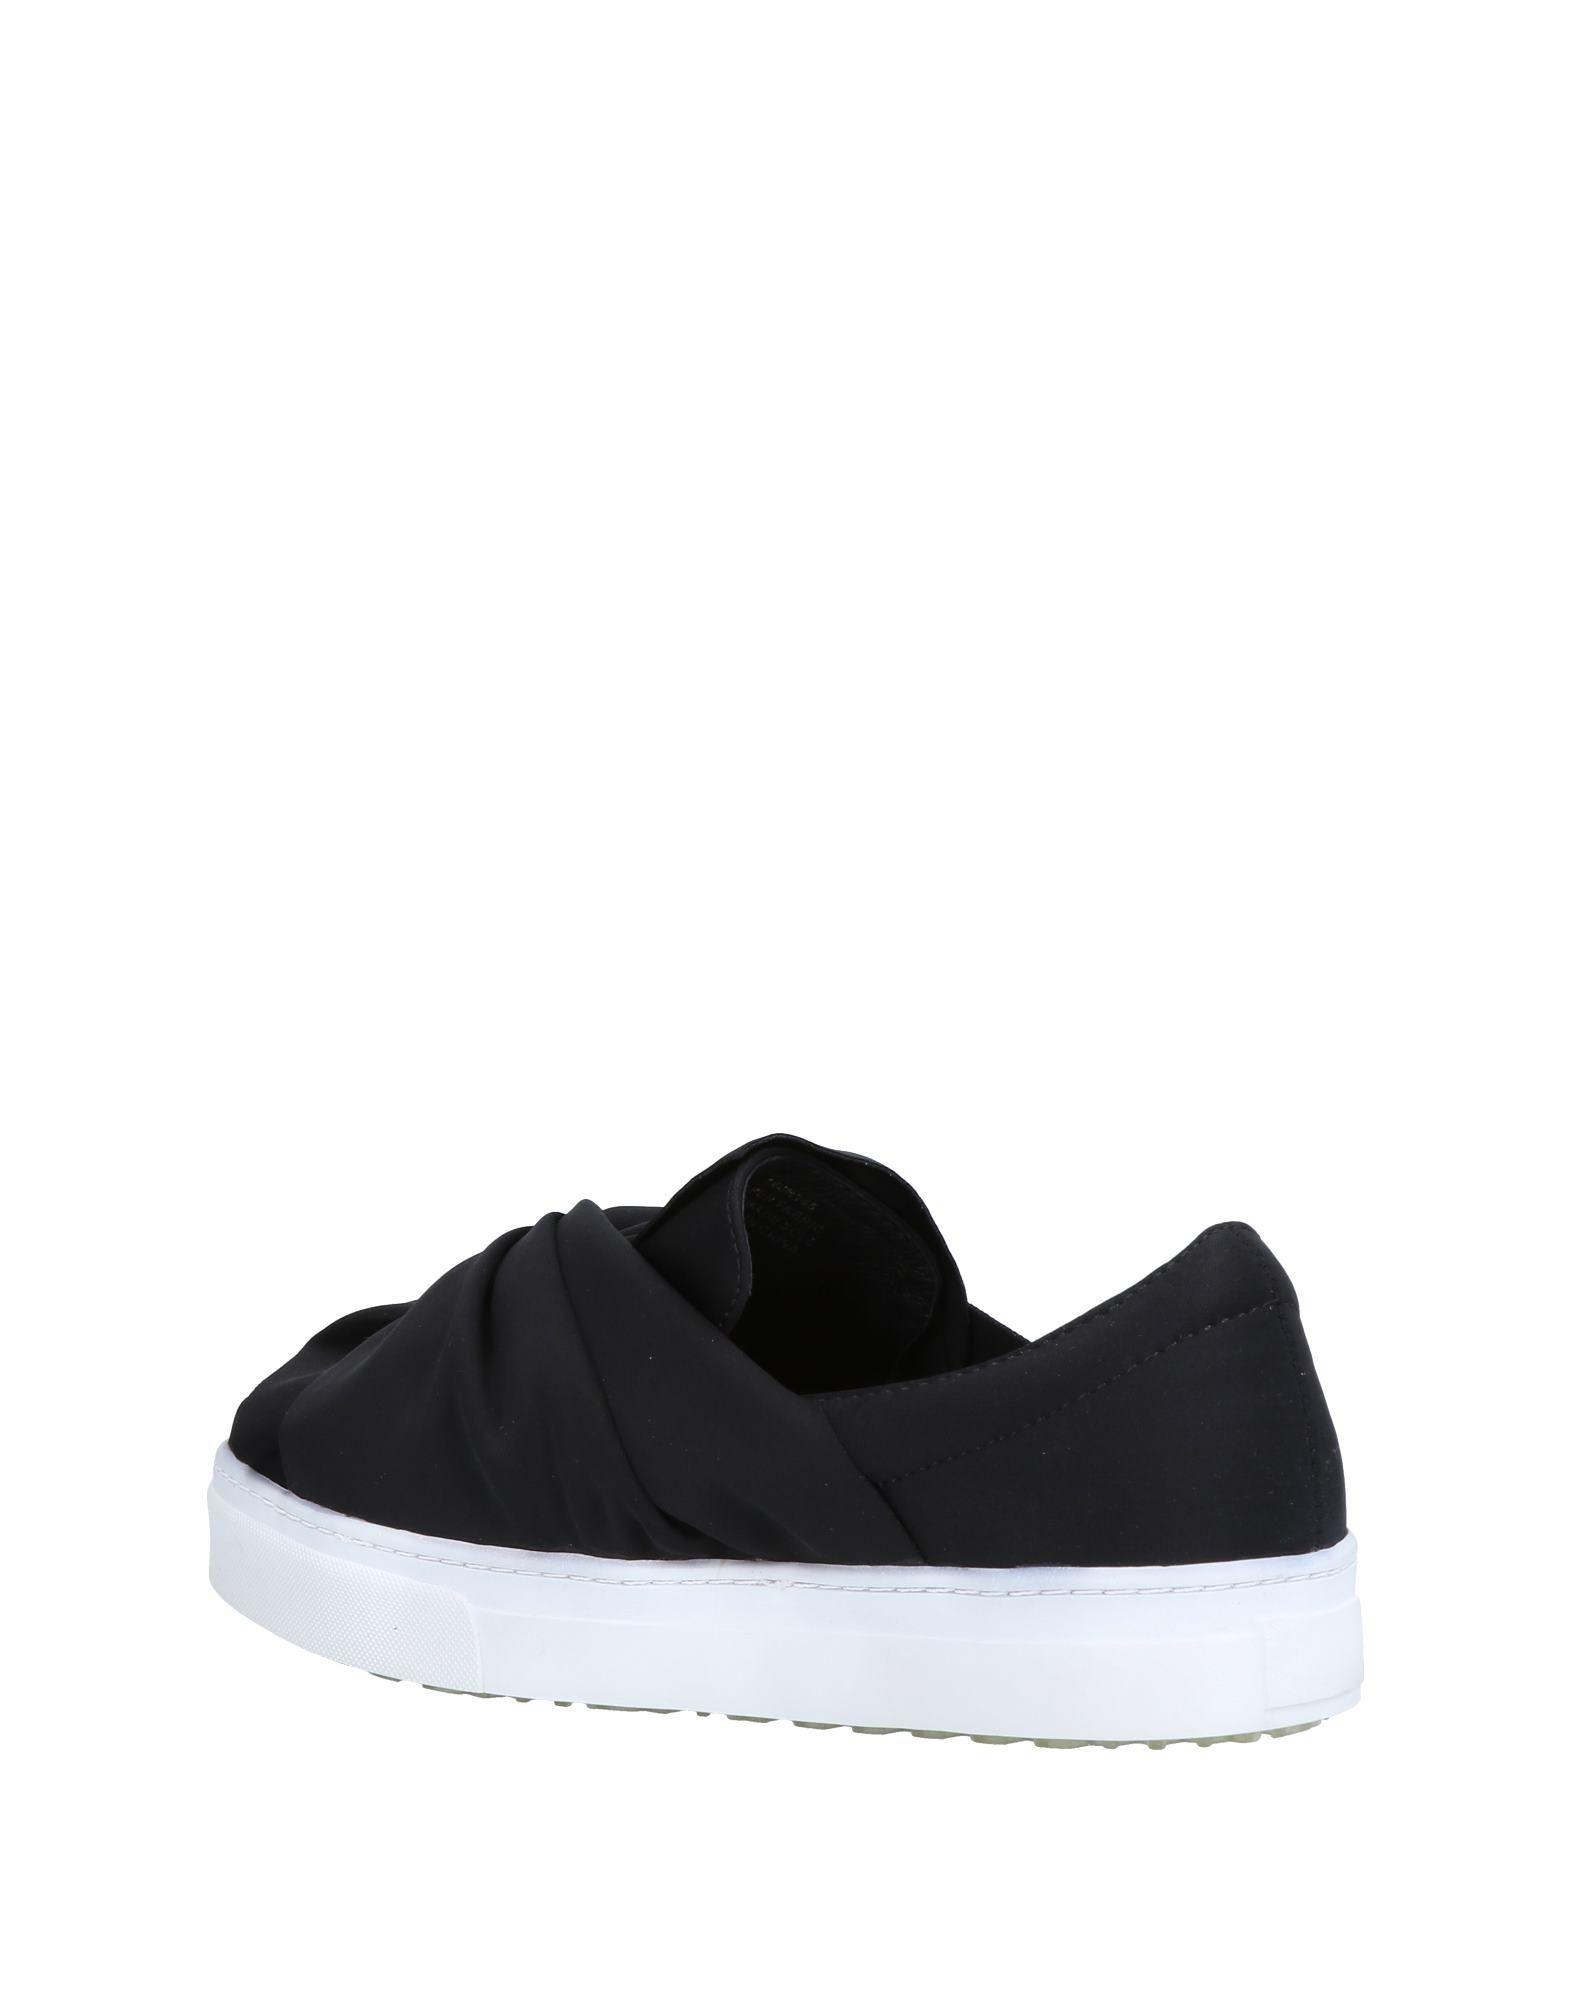 Jeffrey Campbell Sneakers Damen   11491460EN   e2ade5